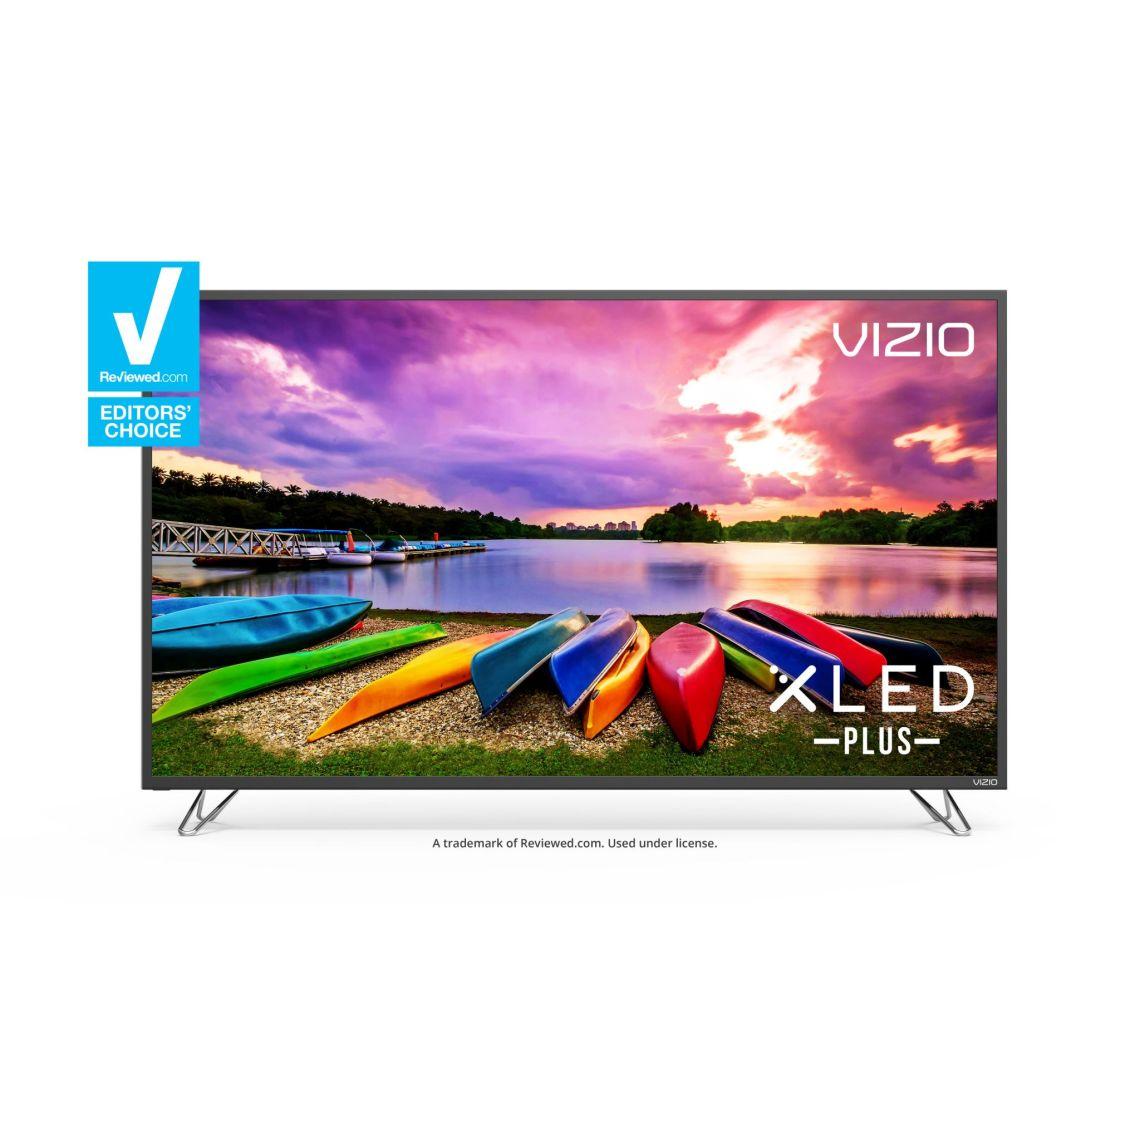 VIZIO 50 Class 4k (2160P) Smart XLED Home Theater Display (M50-E1) - Walmart.com